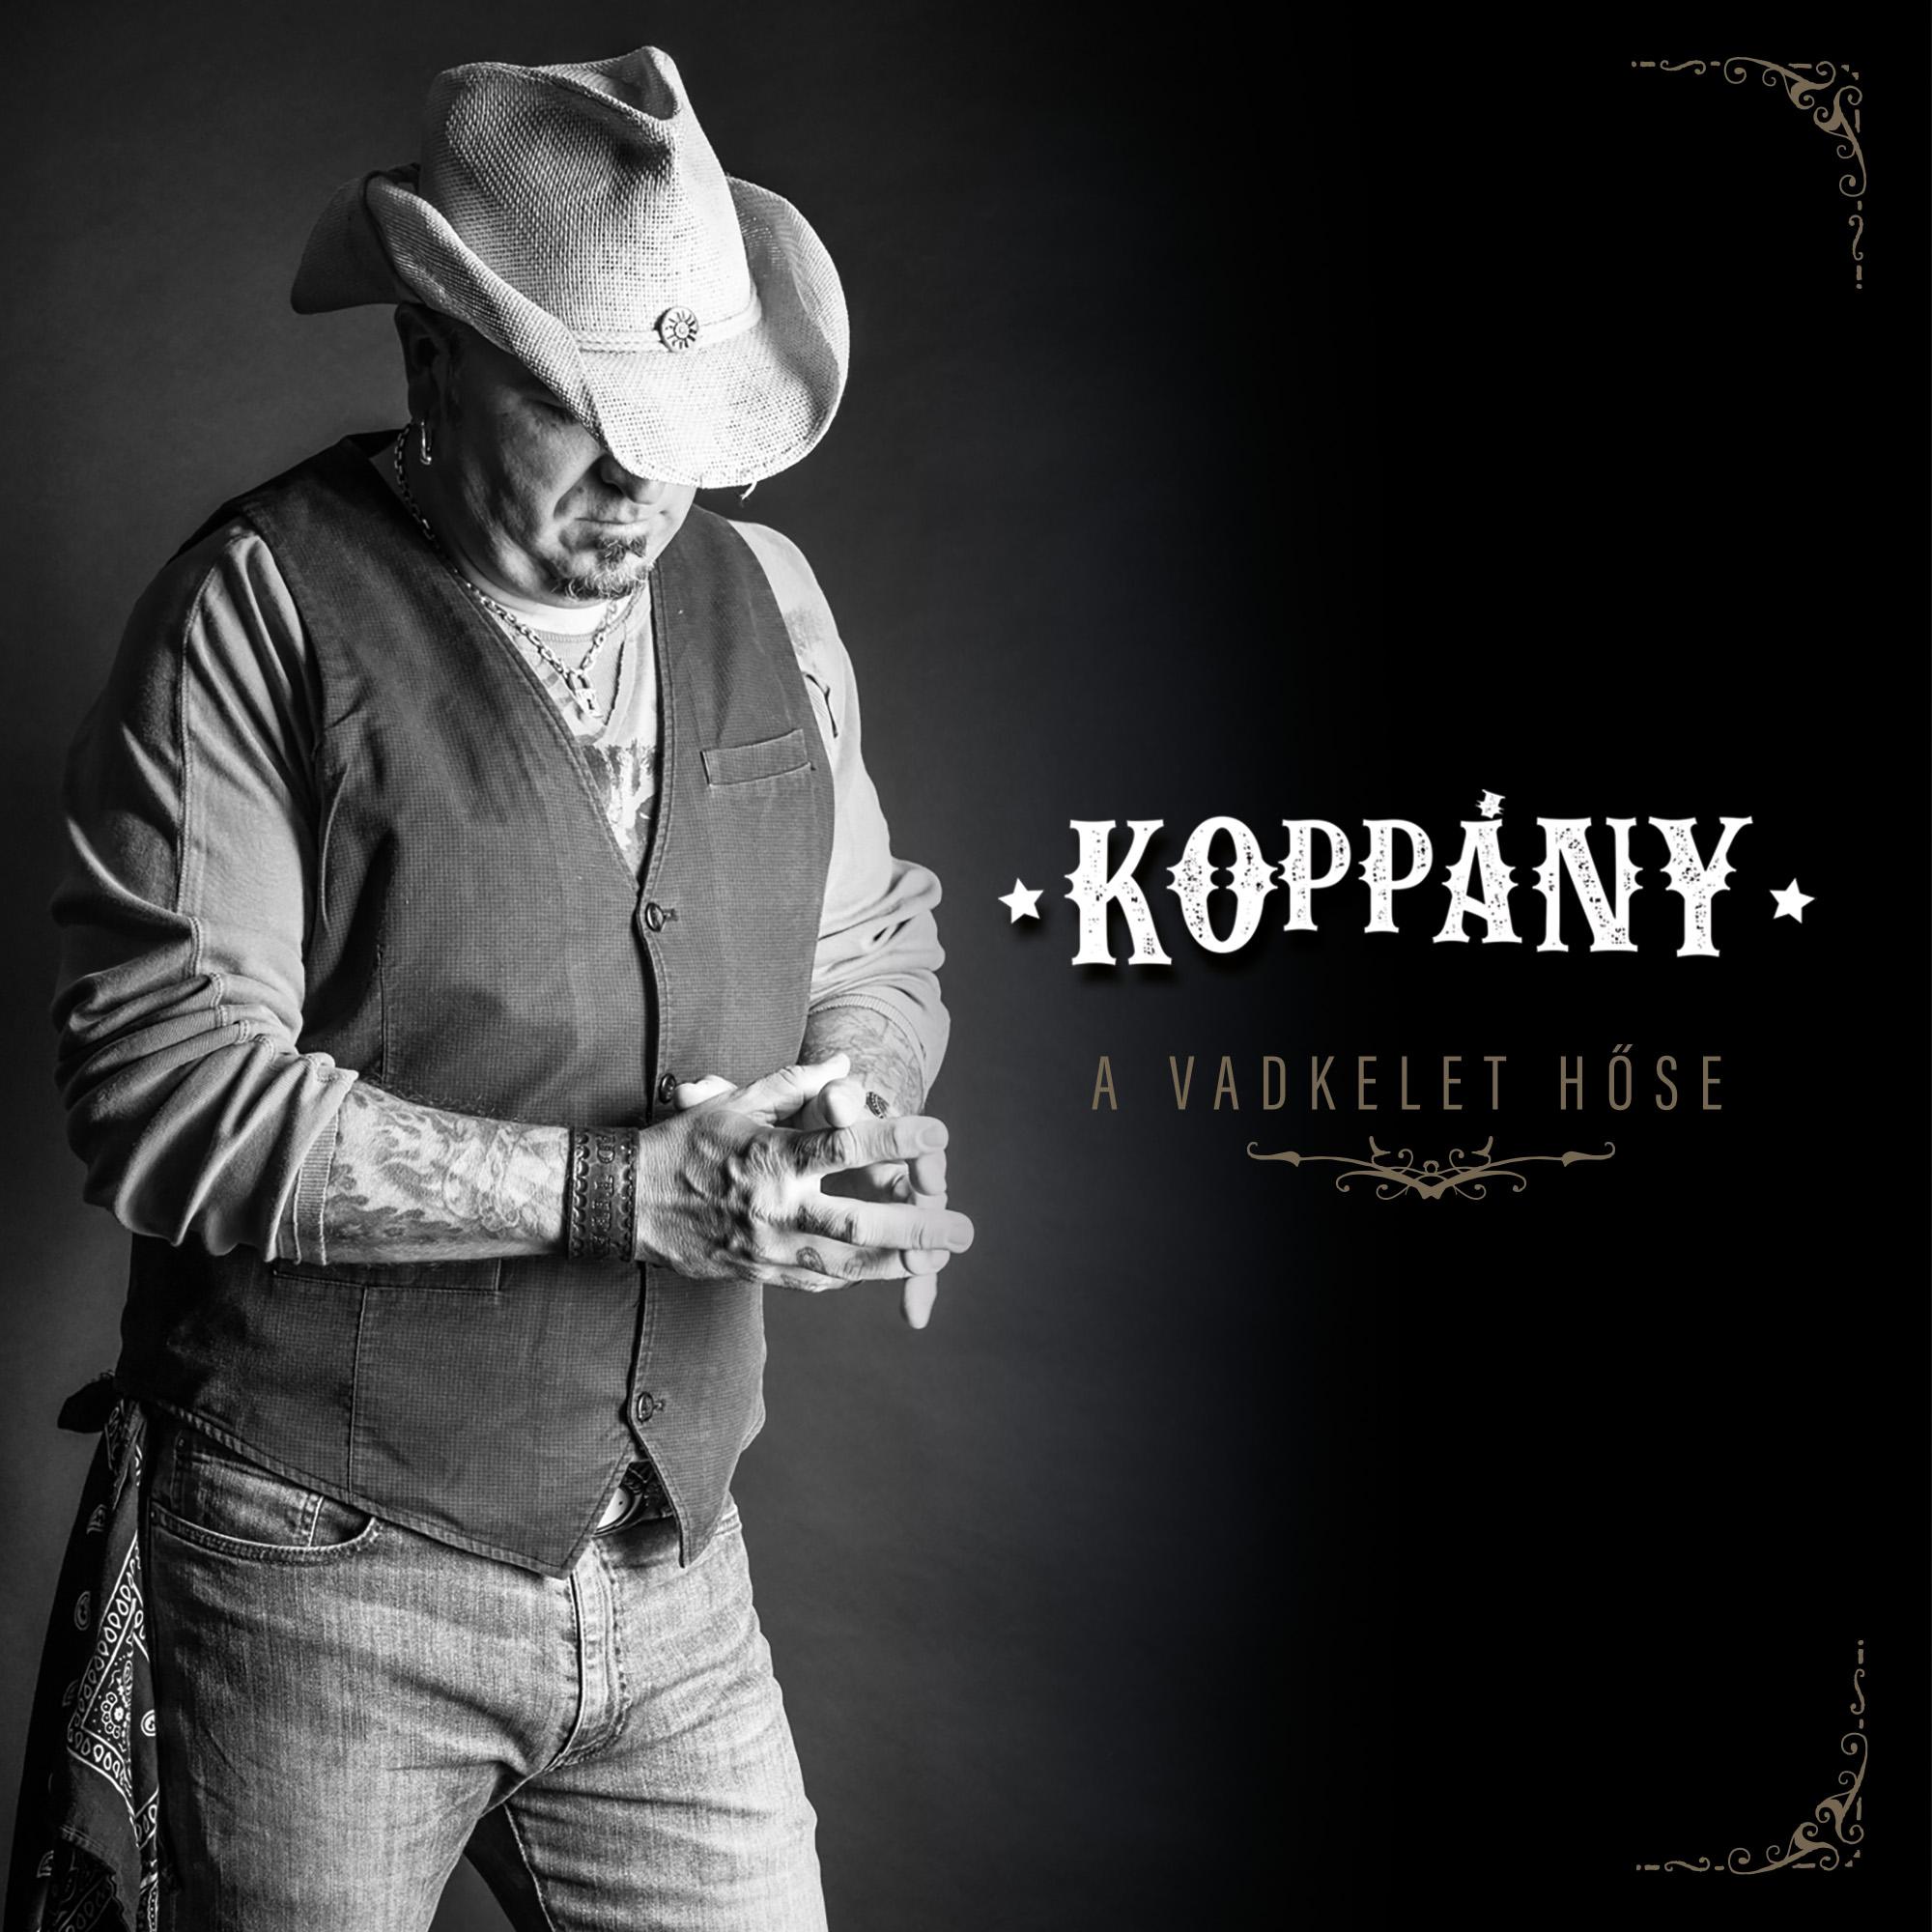 koppany_a_vadkelet_hose_cover_2000.jpg